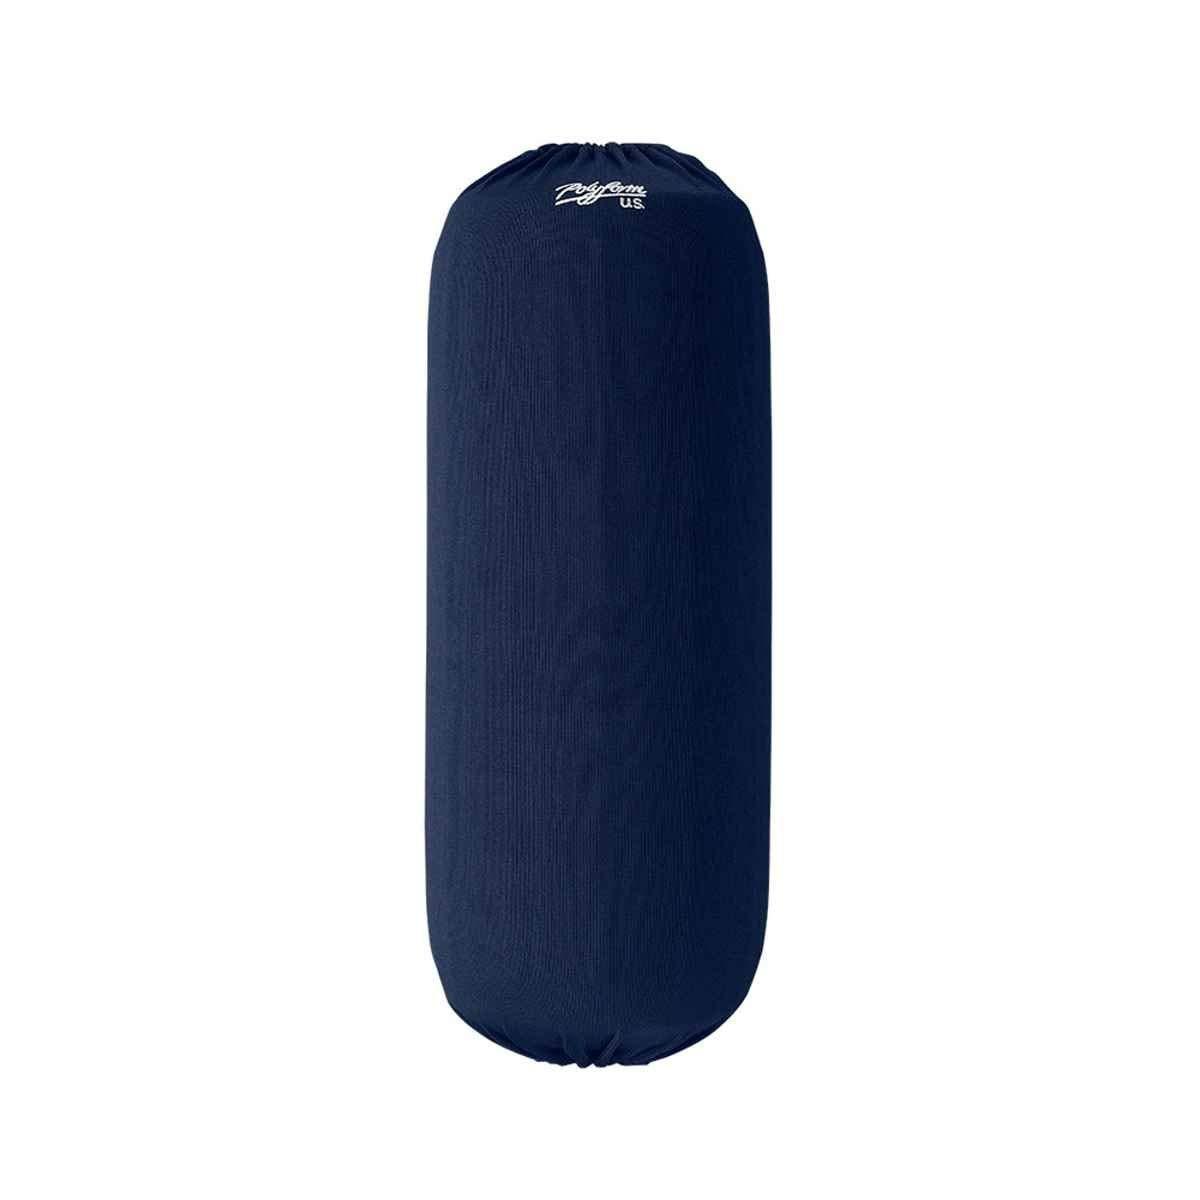 Polyform Fender Cover Blue Htm-3 G-6 by Polyform